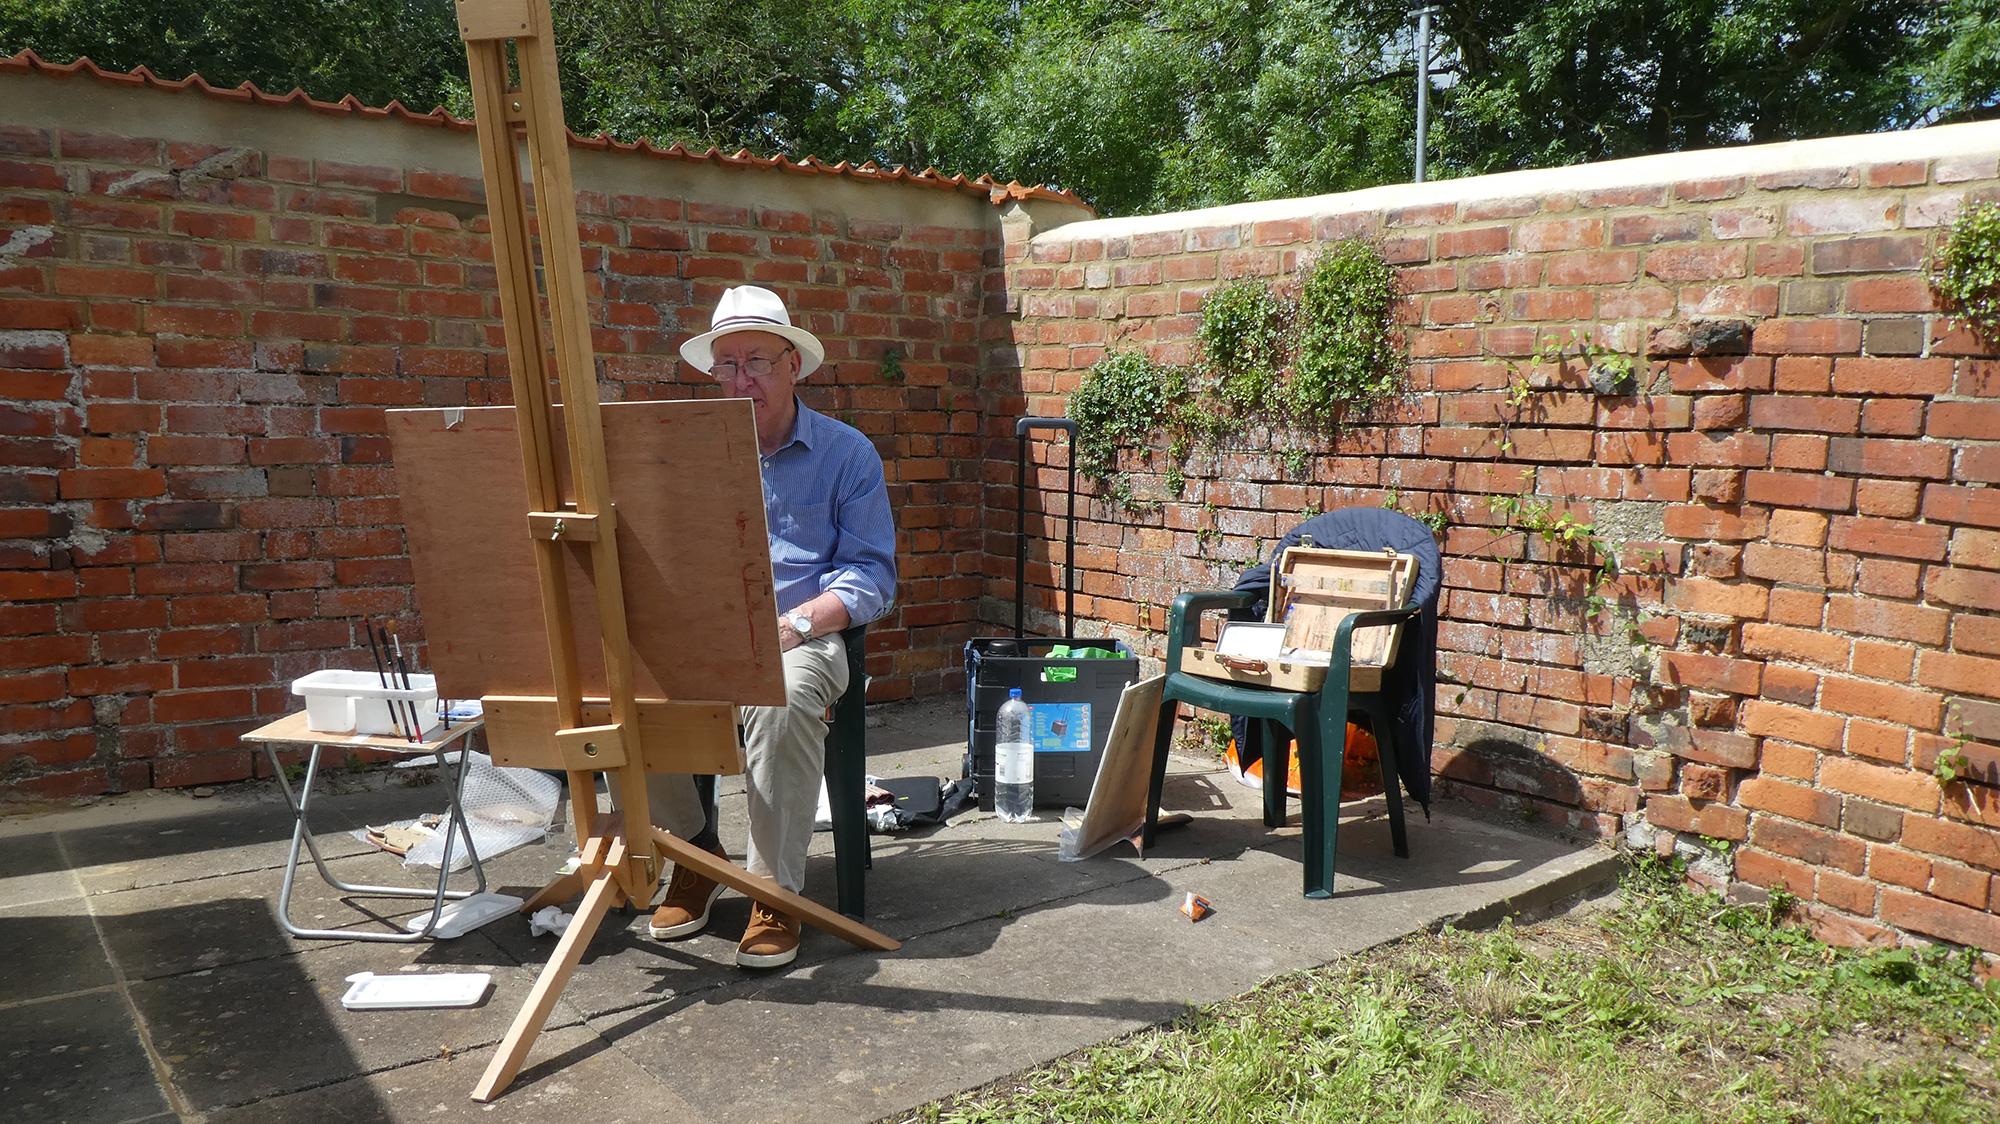 artists-in-the-gardens-gerald-porter-2.jpg